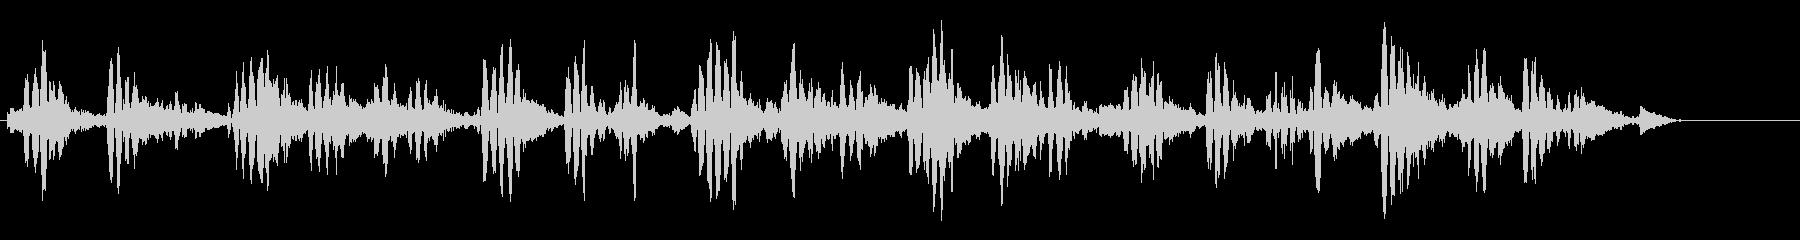 KANT 近未来宇宙人の声効果音2の未再生の波形